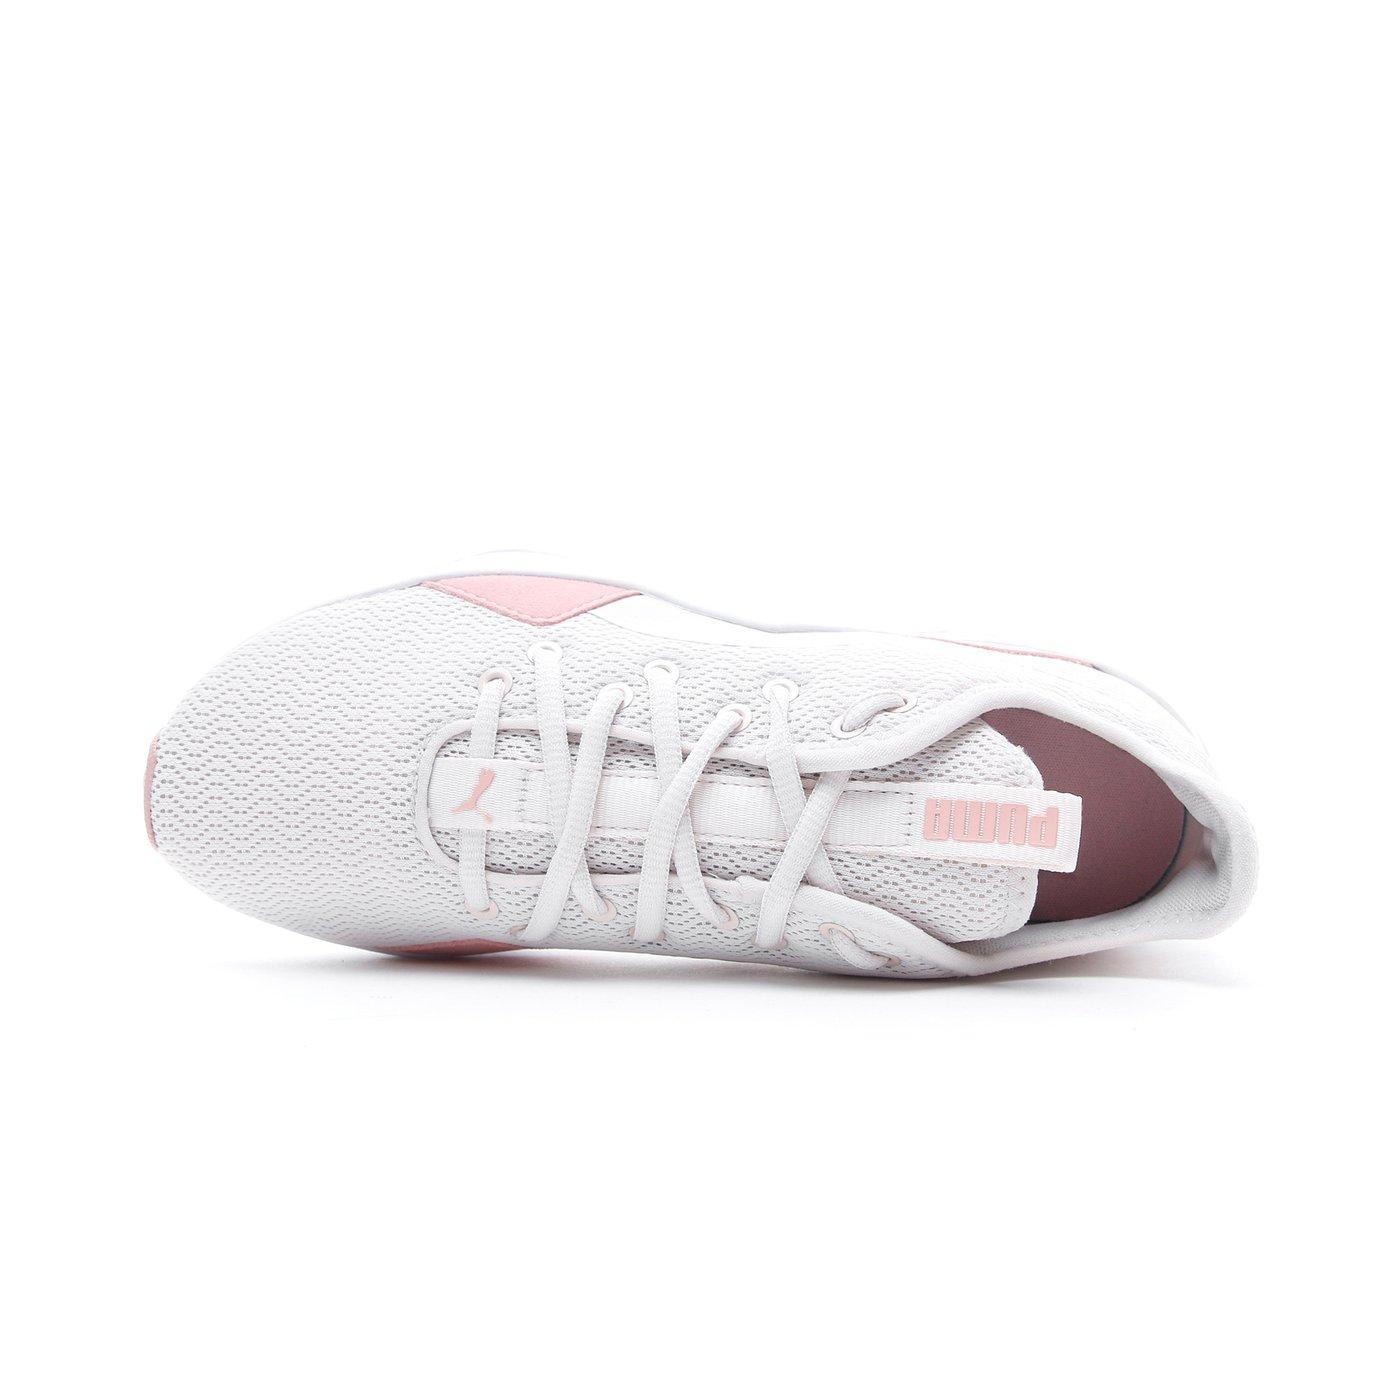 Puma Incite Fs Shift Kadın Pembe Spor Ayakkabı